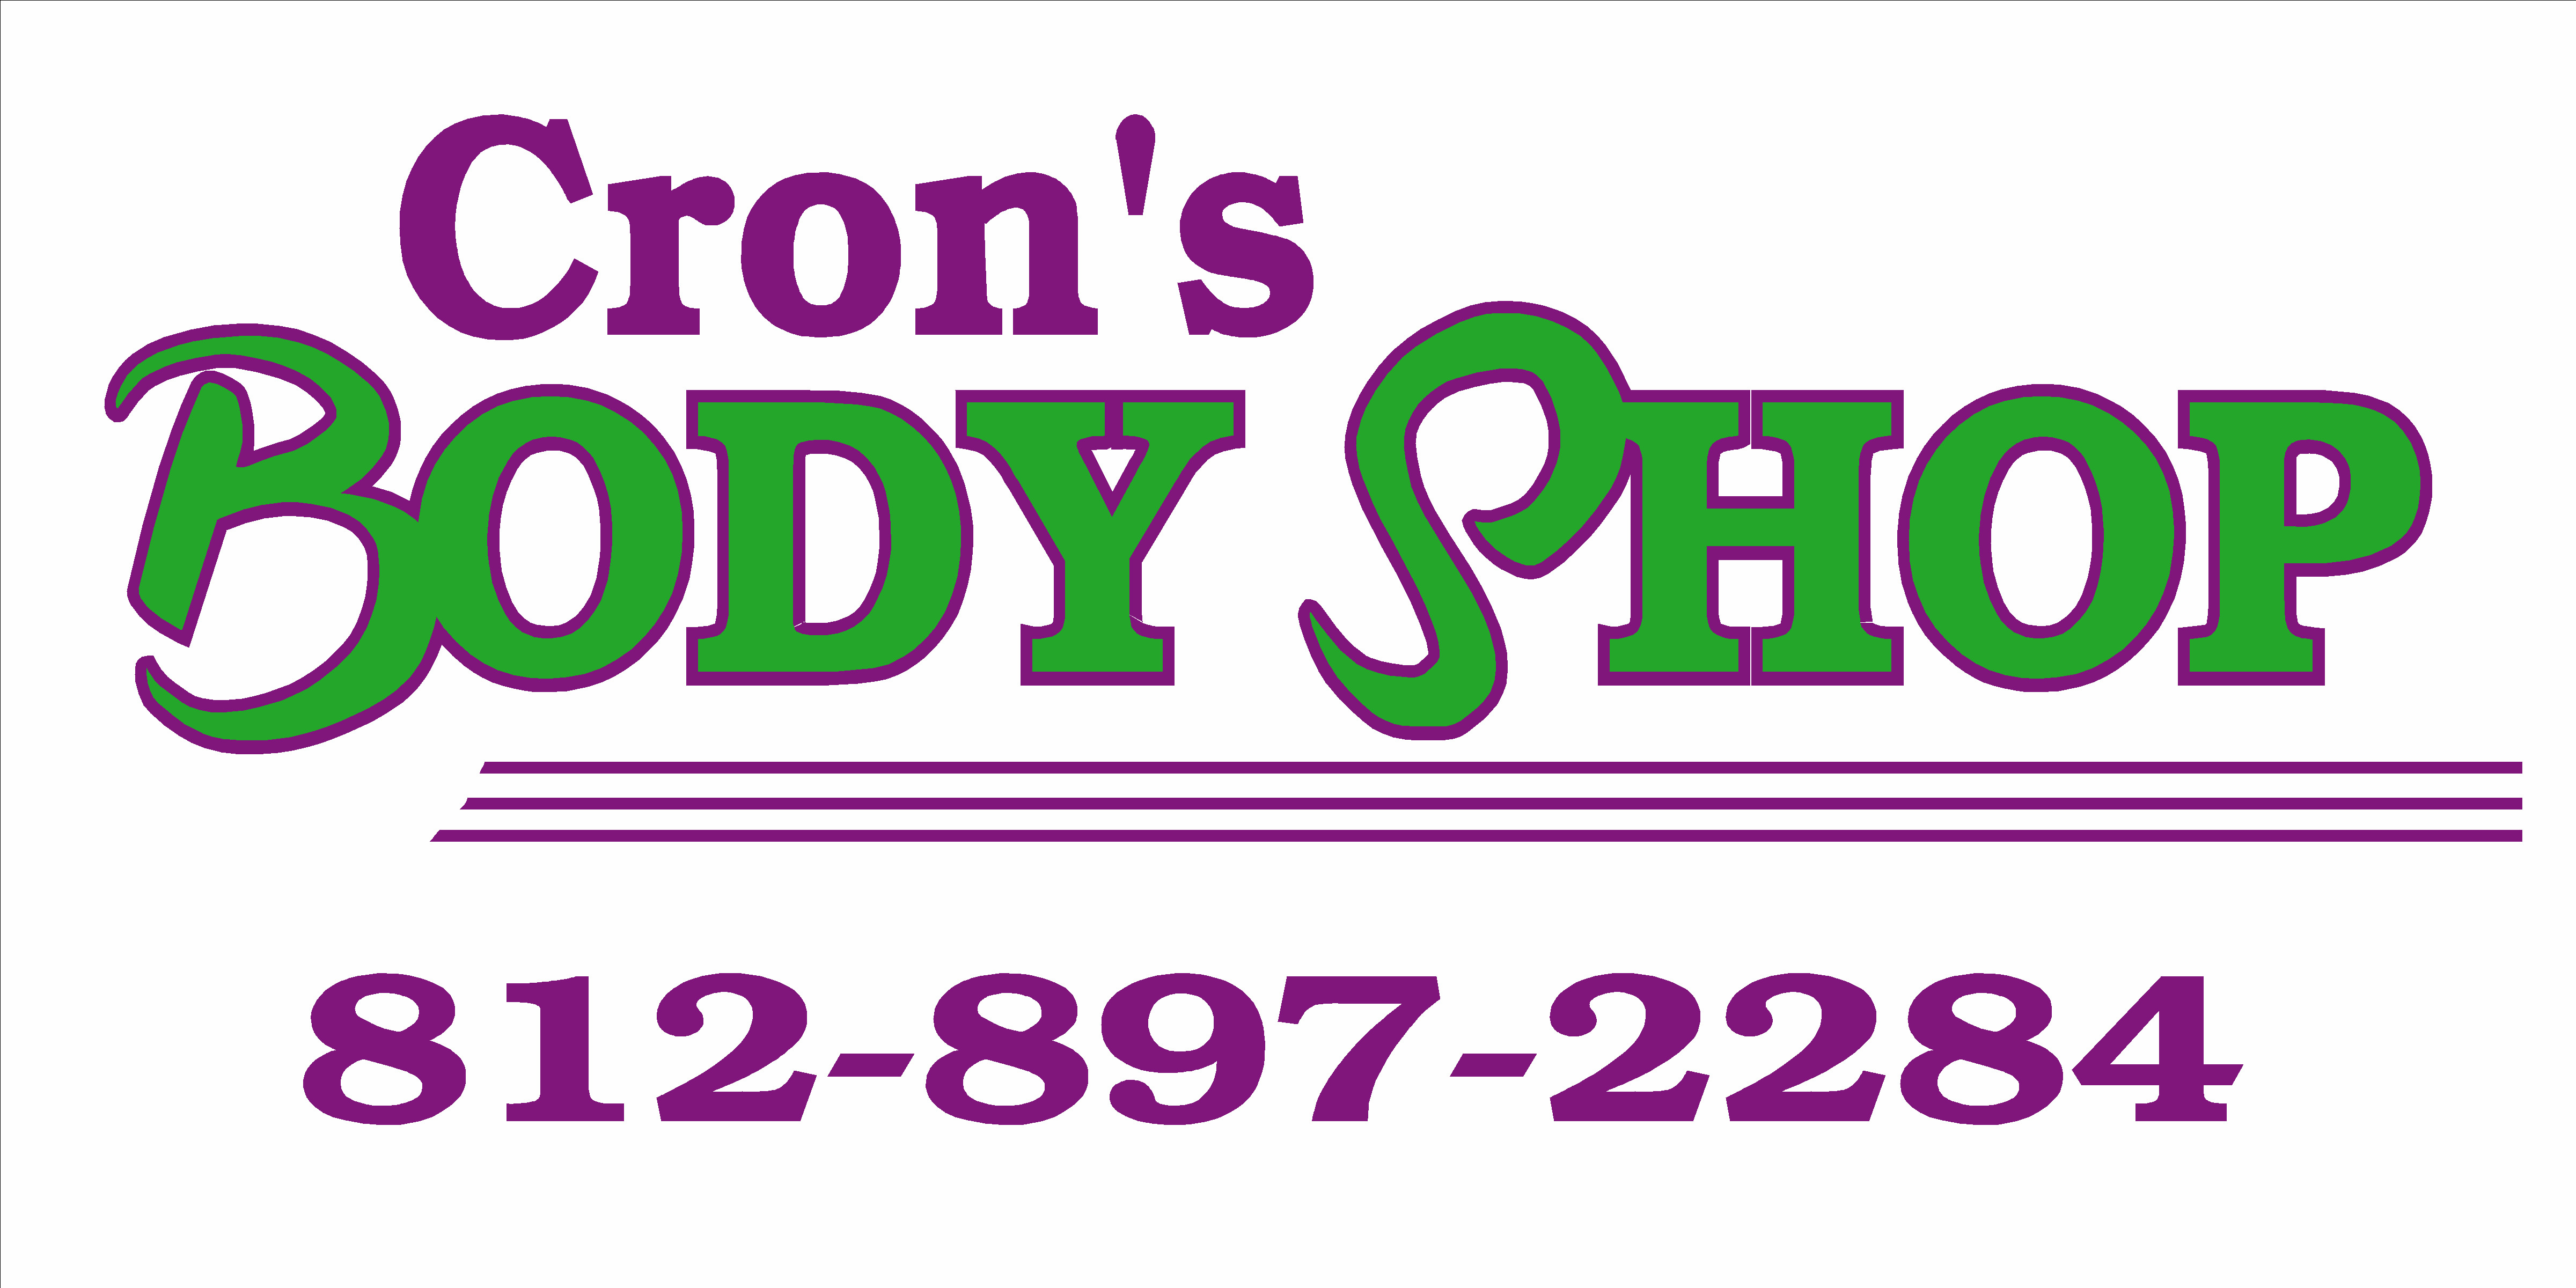 Crons Body Shop